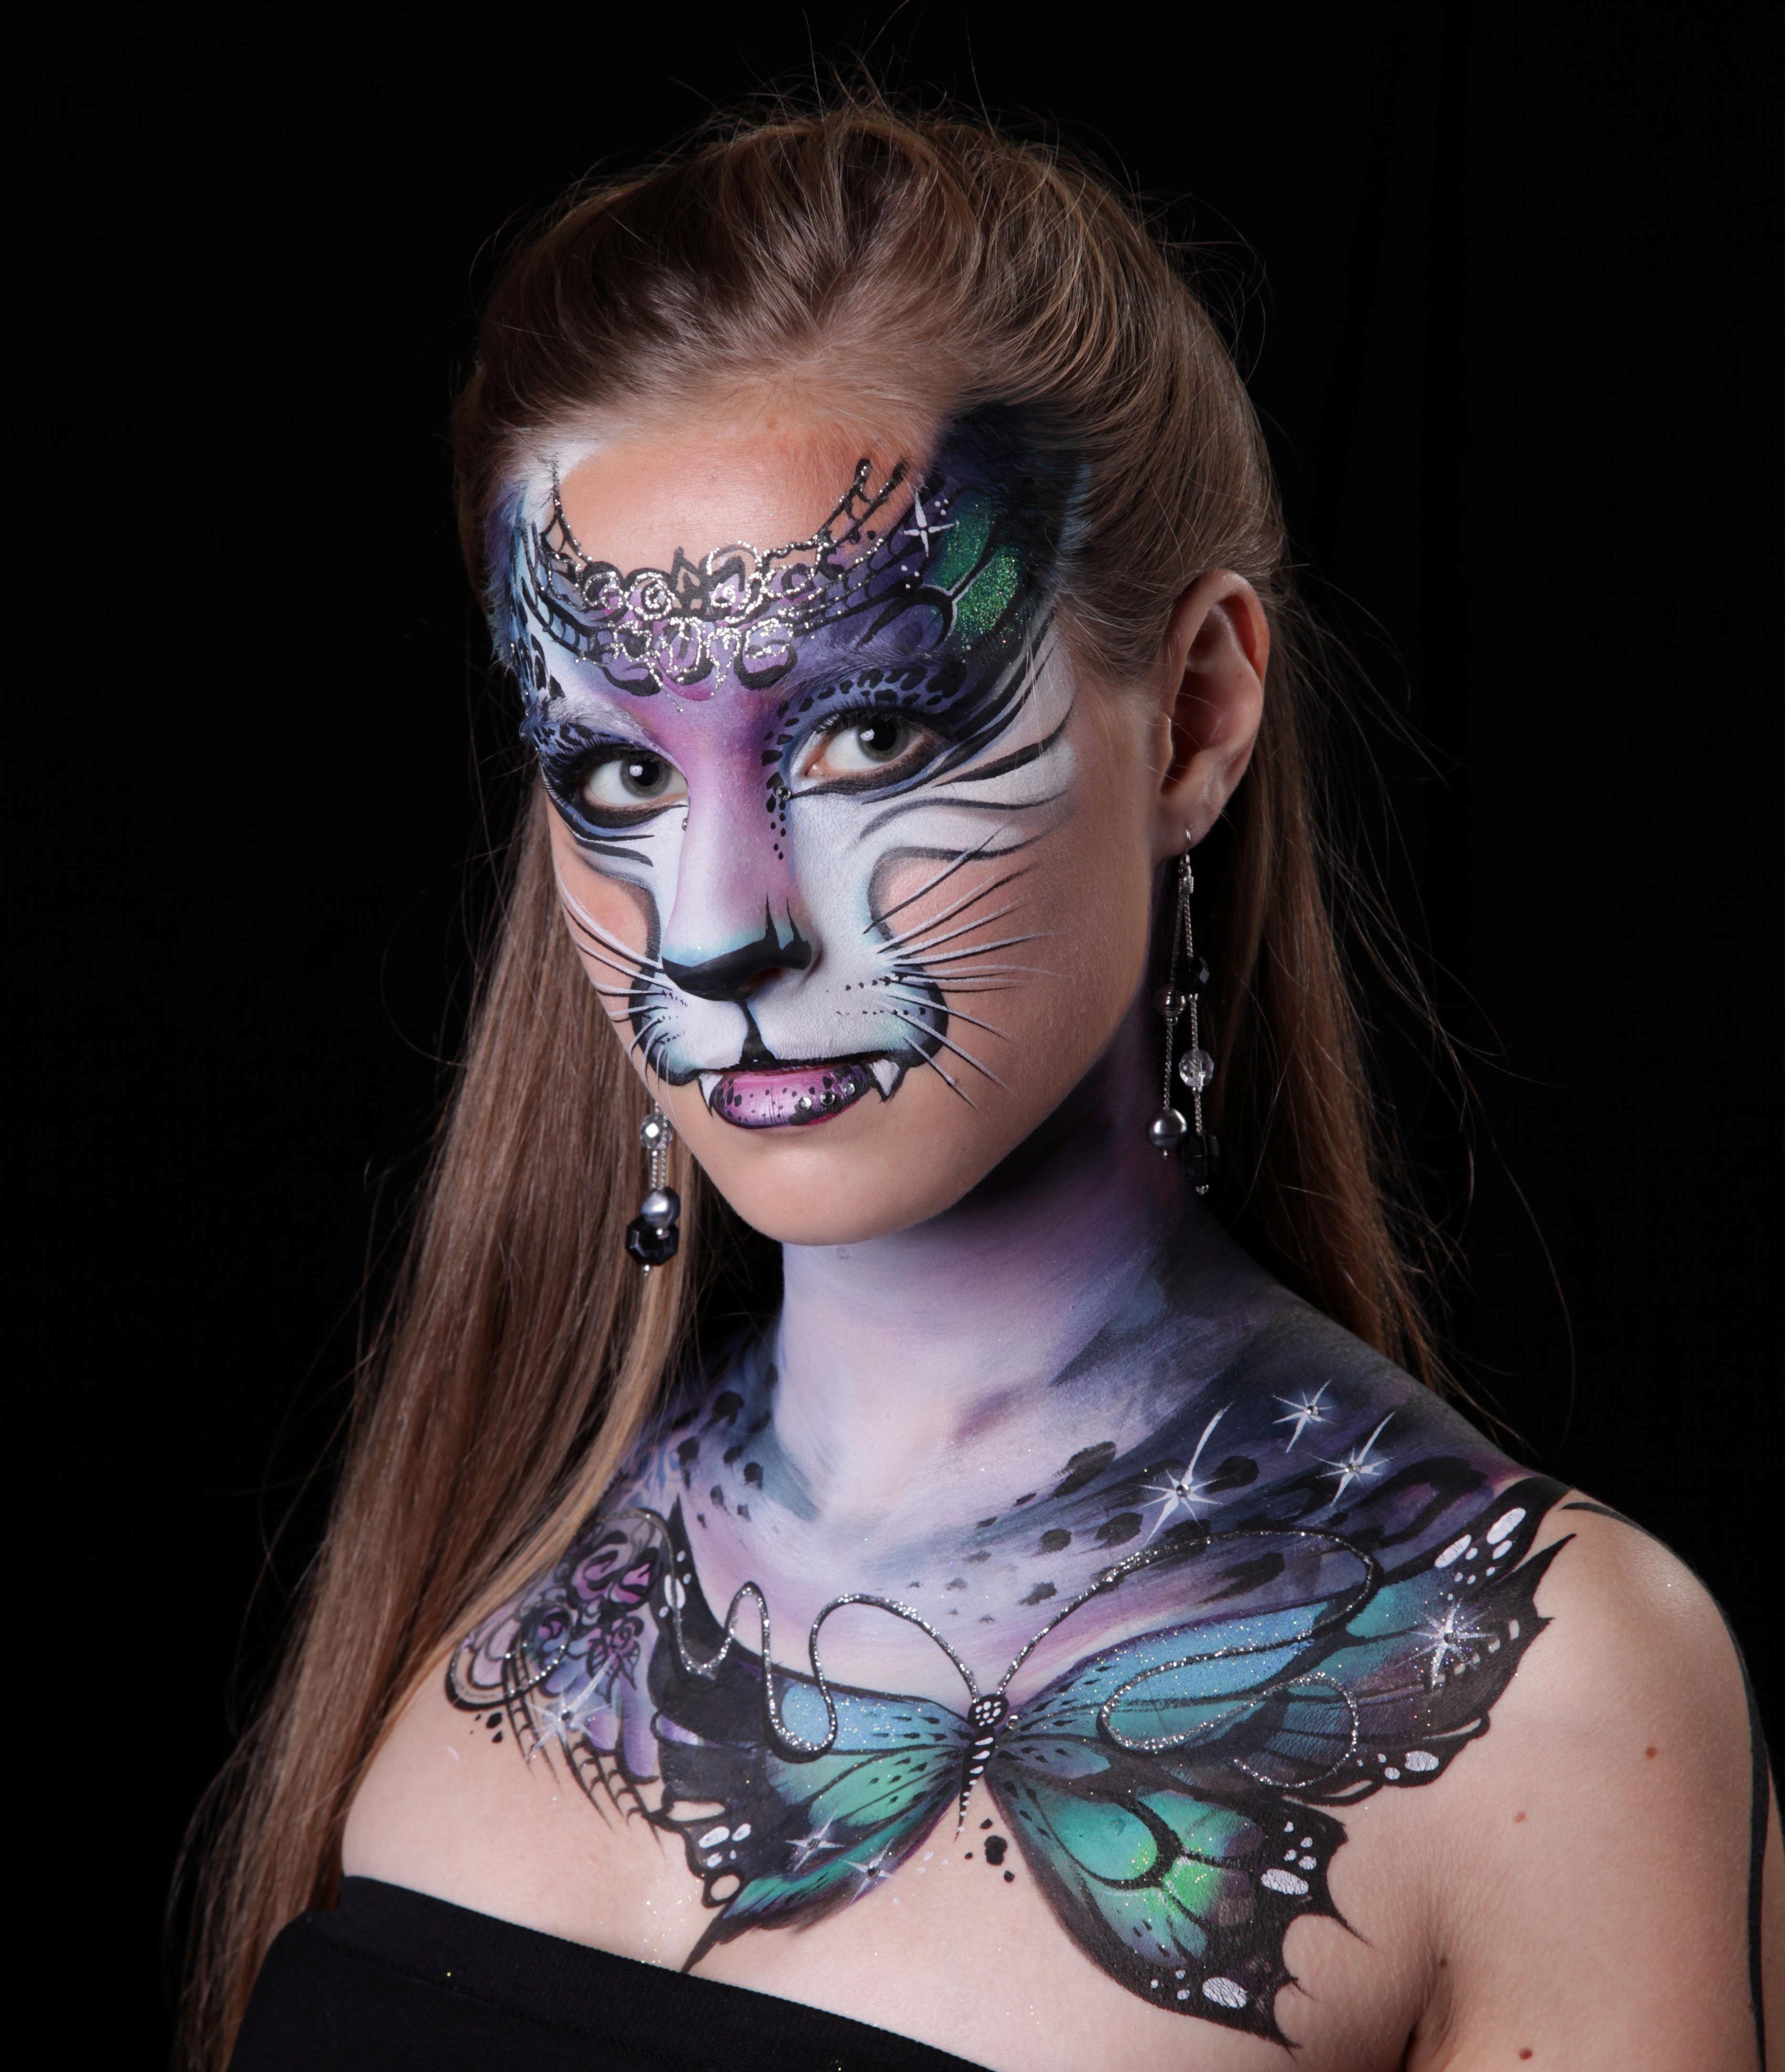 Картинки боди-арта на лице